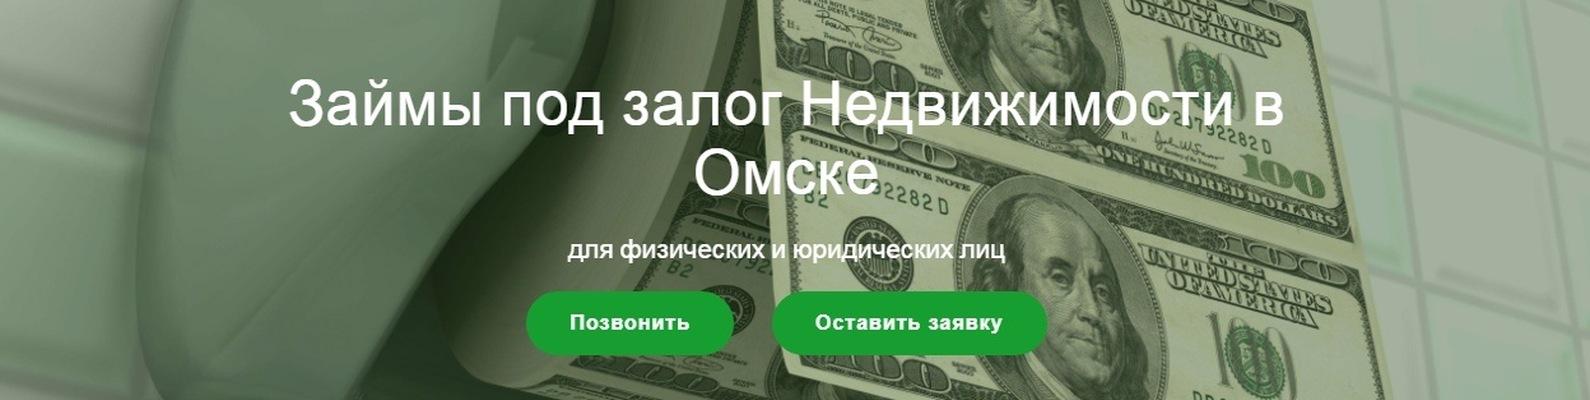 кредит под залог частного дома банки